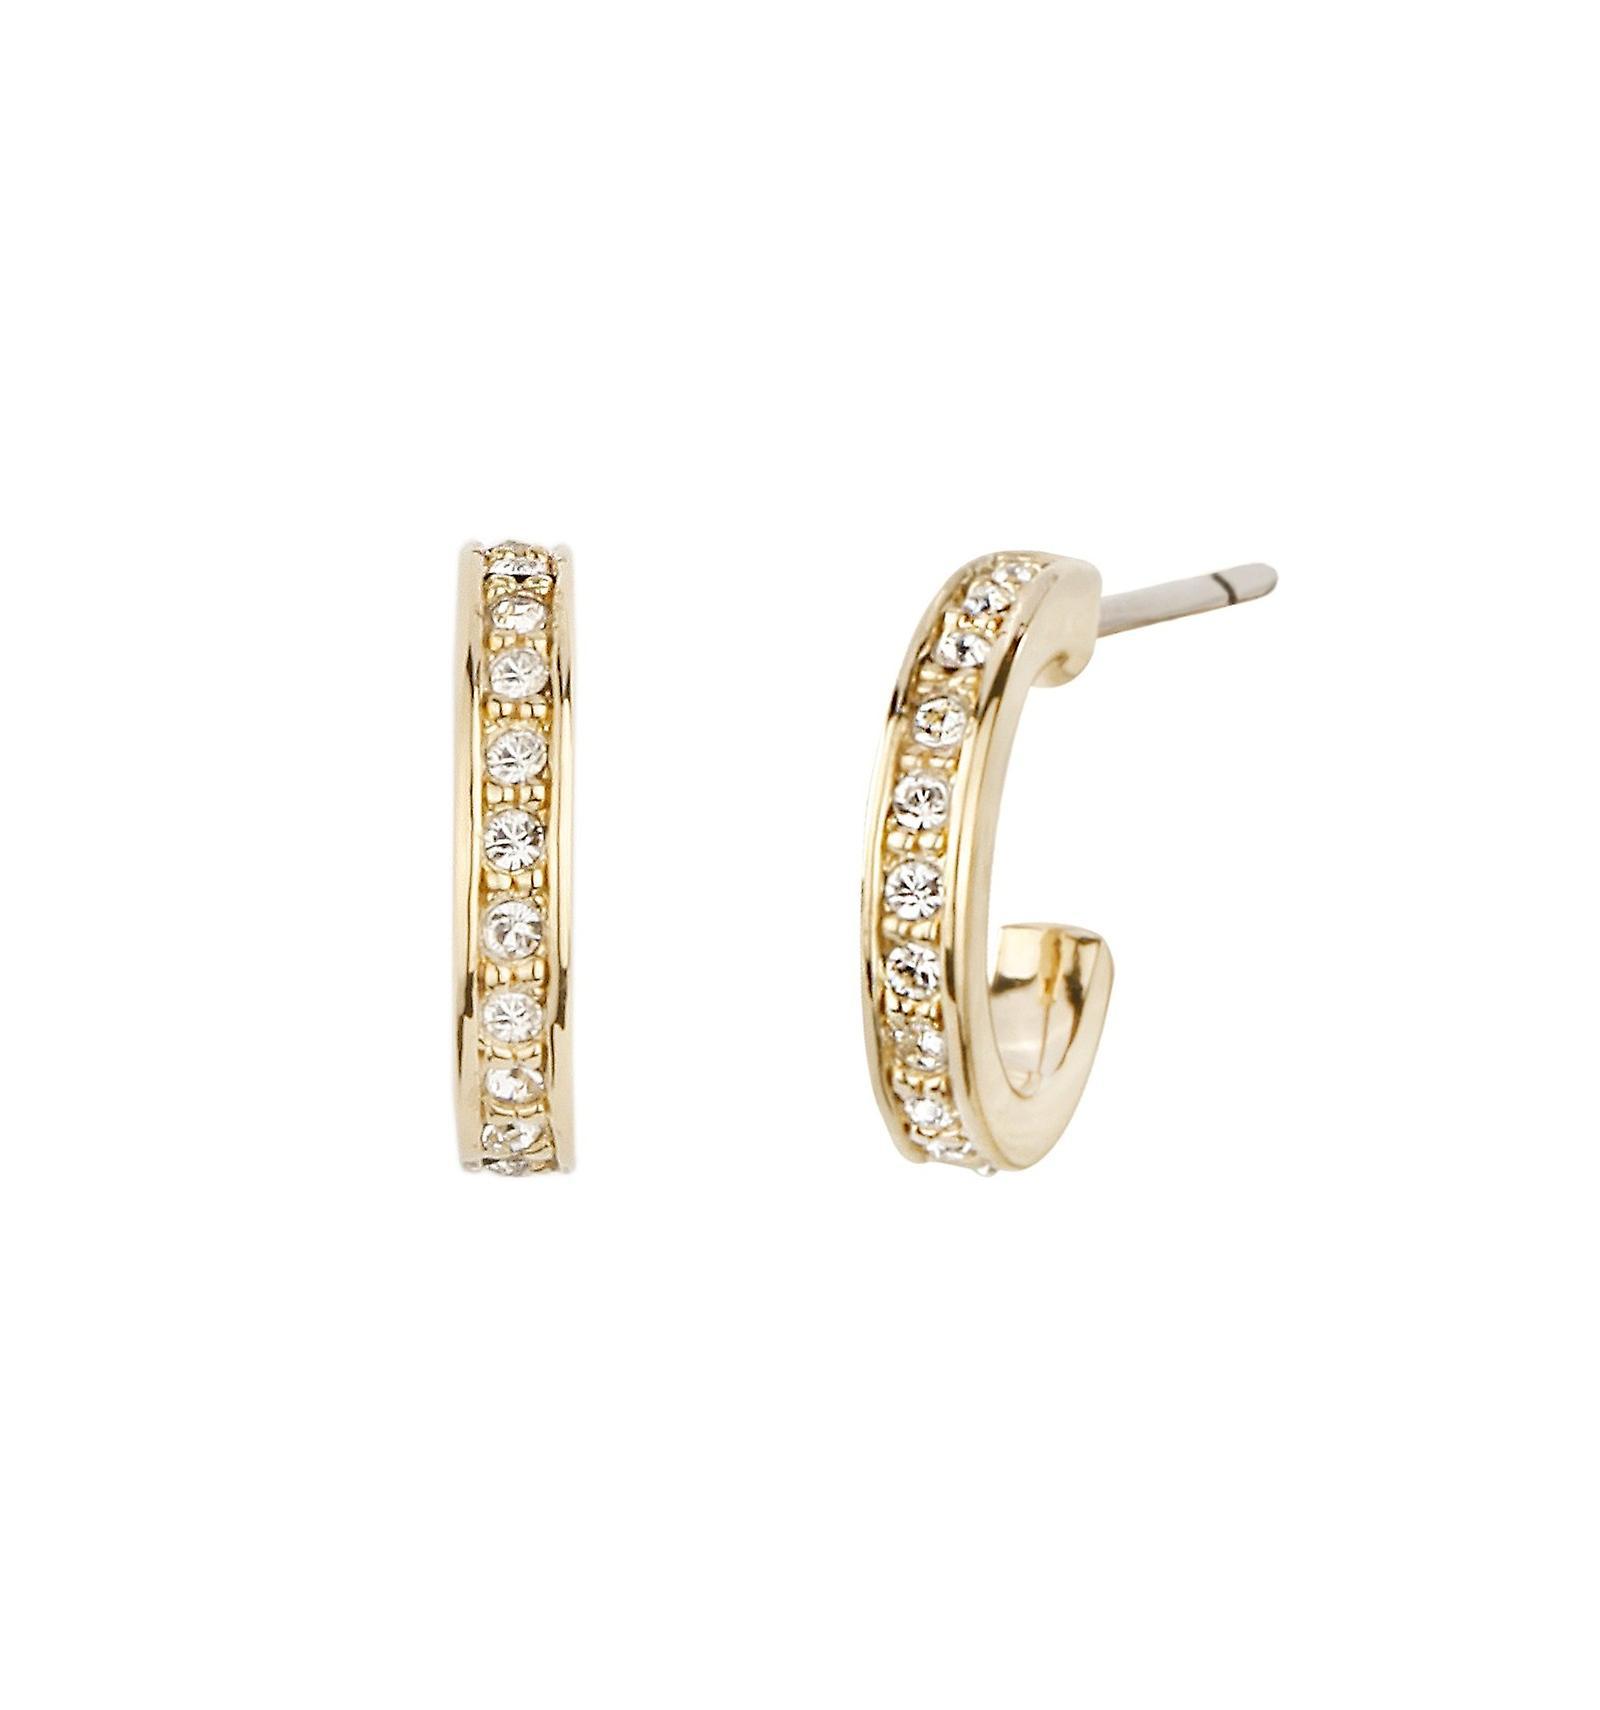 Traveller hoop earring - 22ct gold plated - Swarovski Crystals - 11mm - 157121